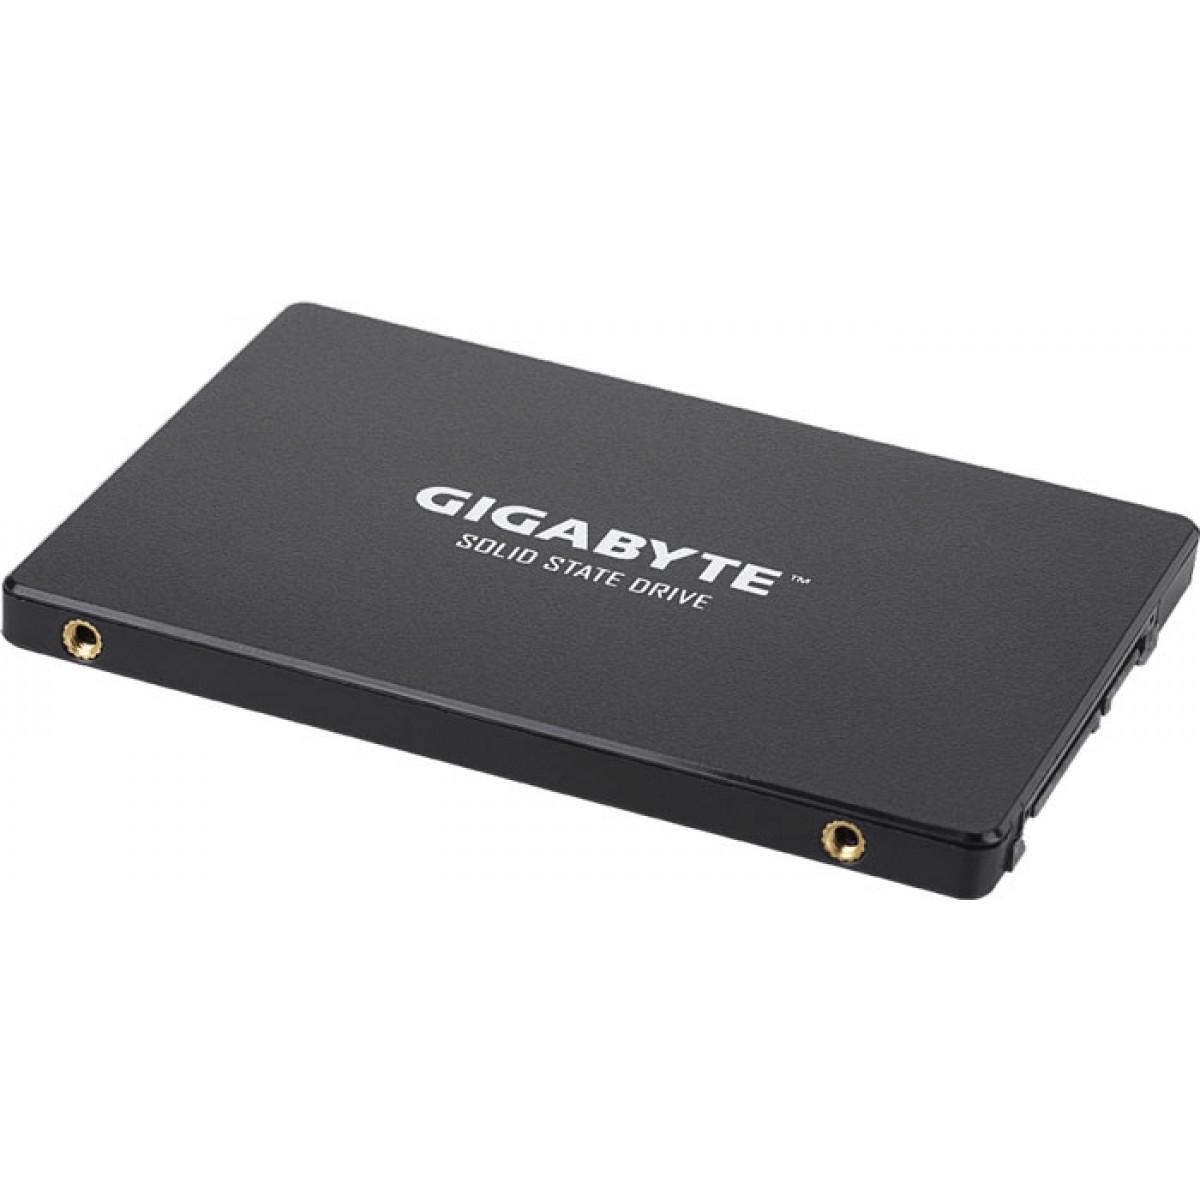 SSD Gigabyte, 240GB, Sata III, Leitura 500MBs e Gravação 420MBs, GP-GSTFS31240GNTD